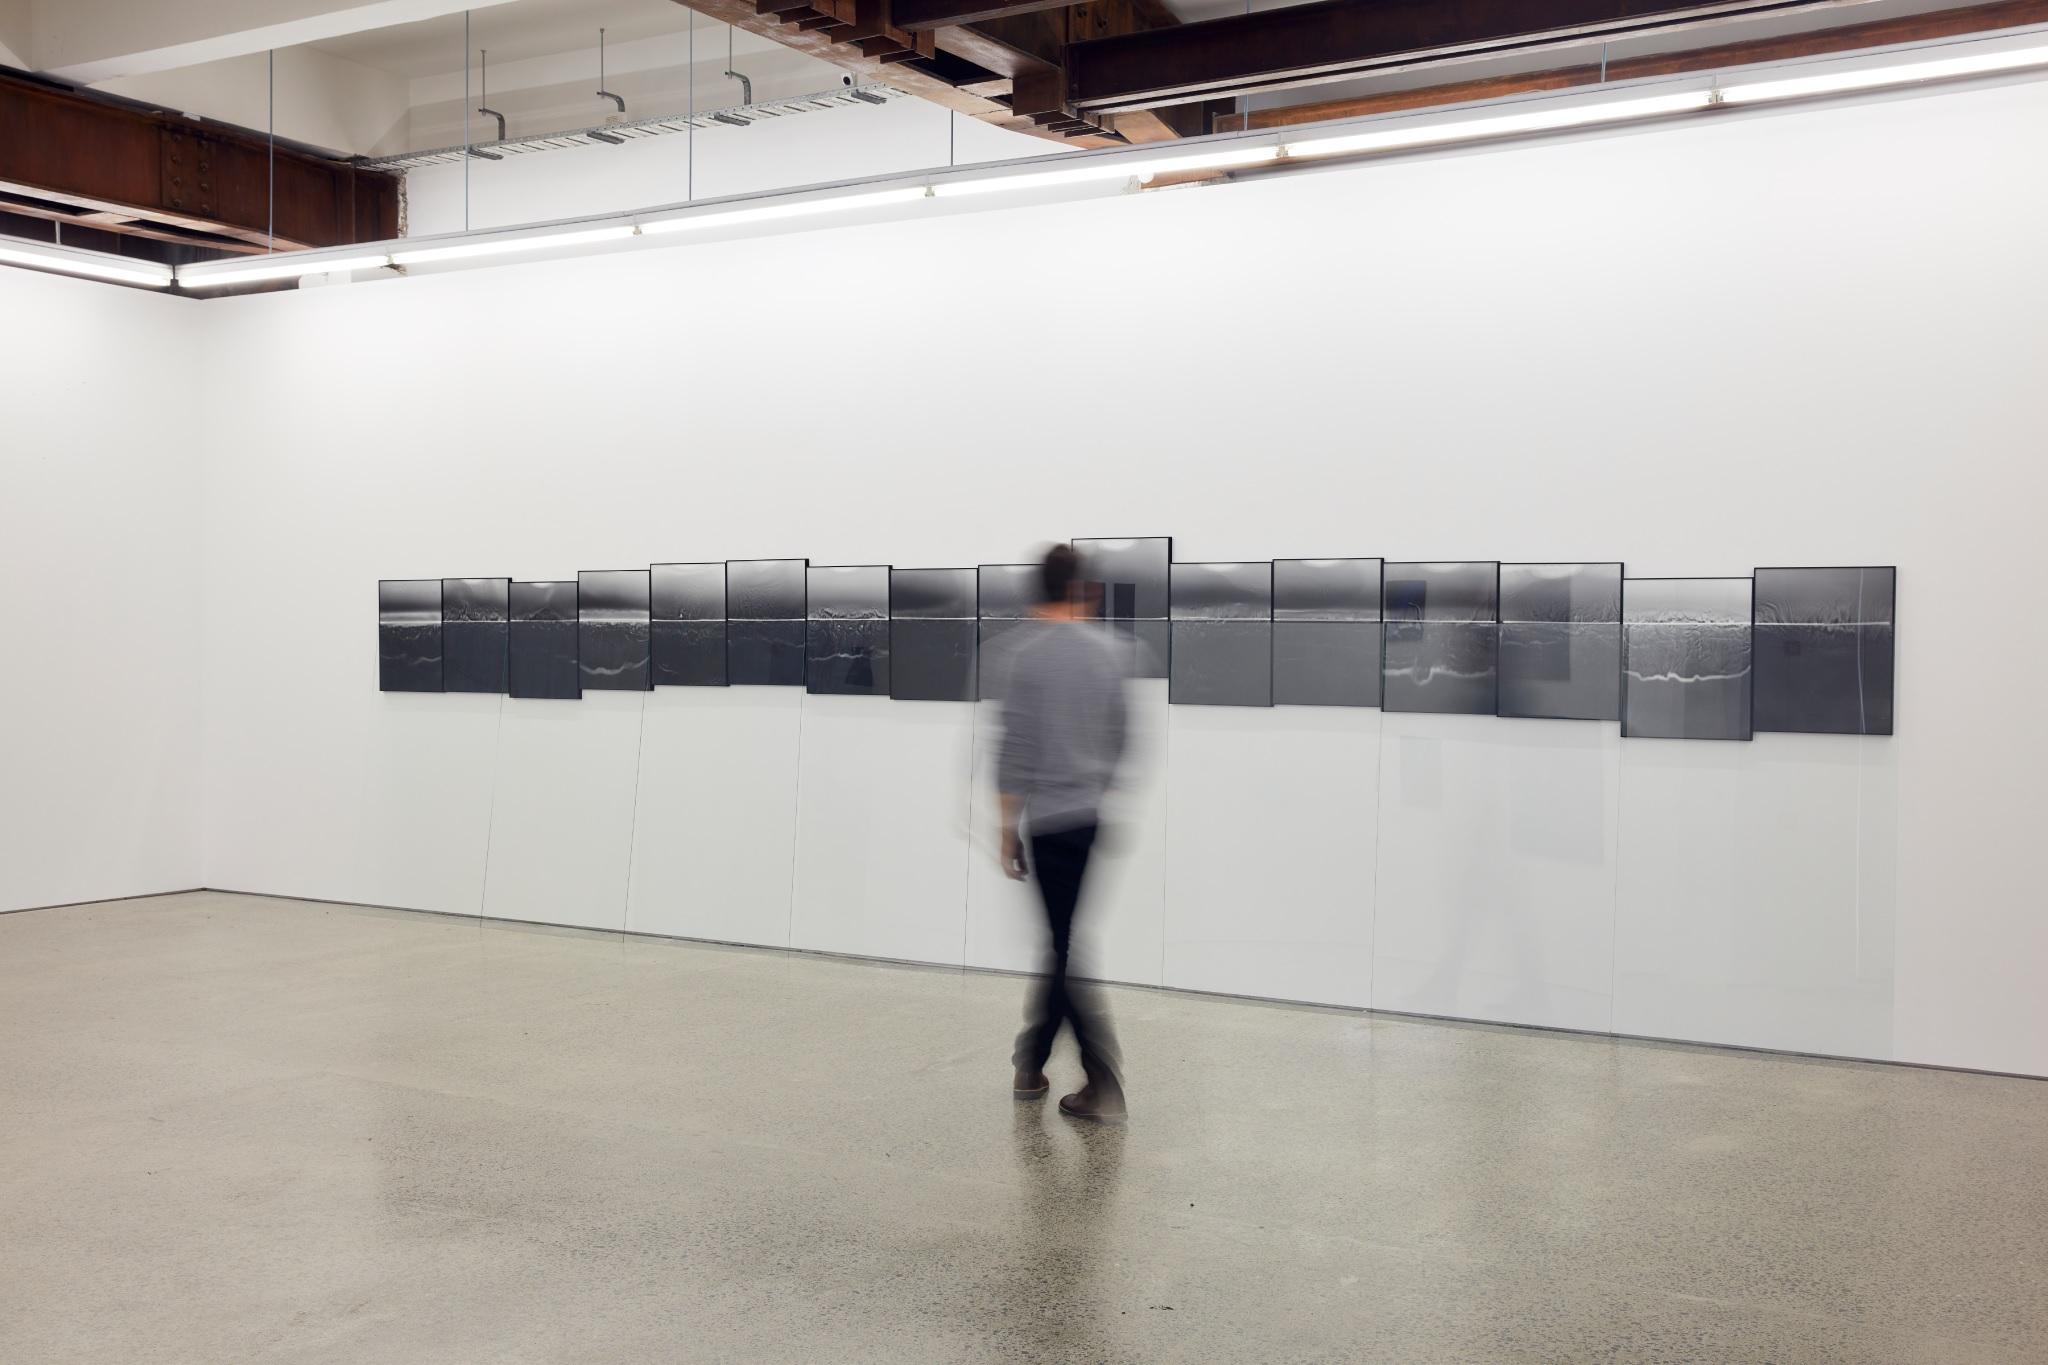 Open Surface (Holon),  2018  Silver gelatin prints, museum glass in artist frames  7300mm x 600mm